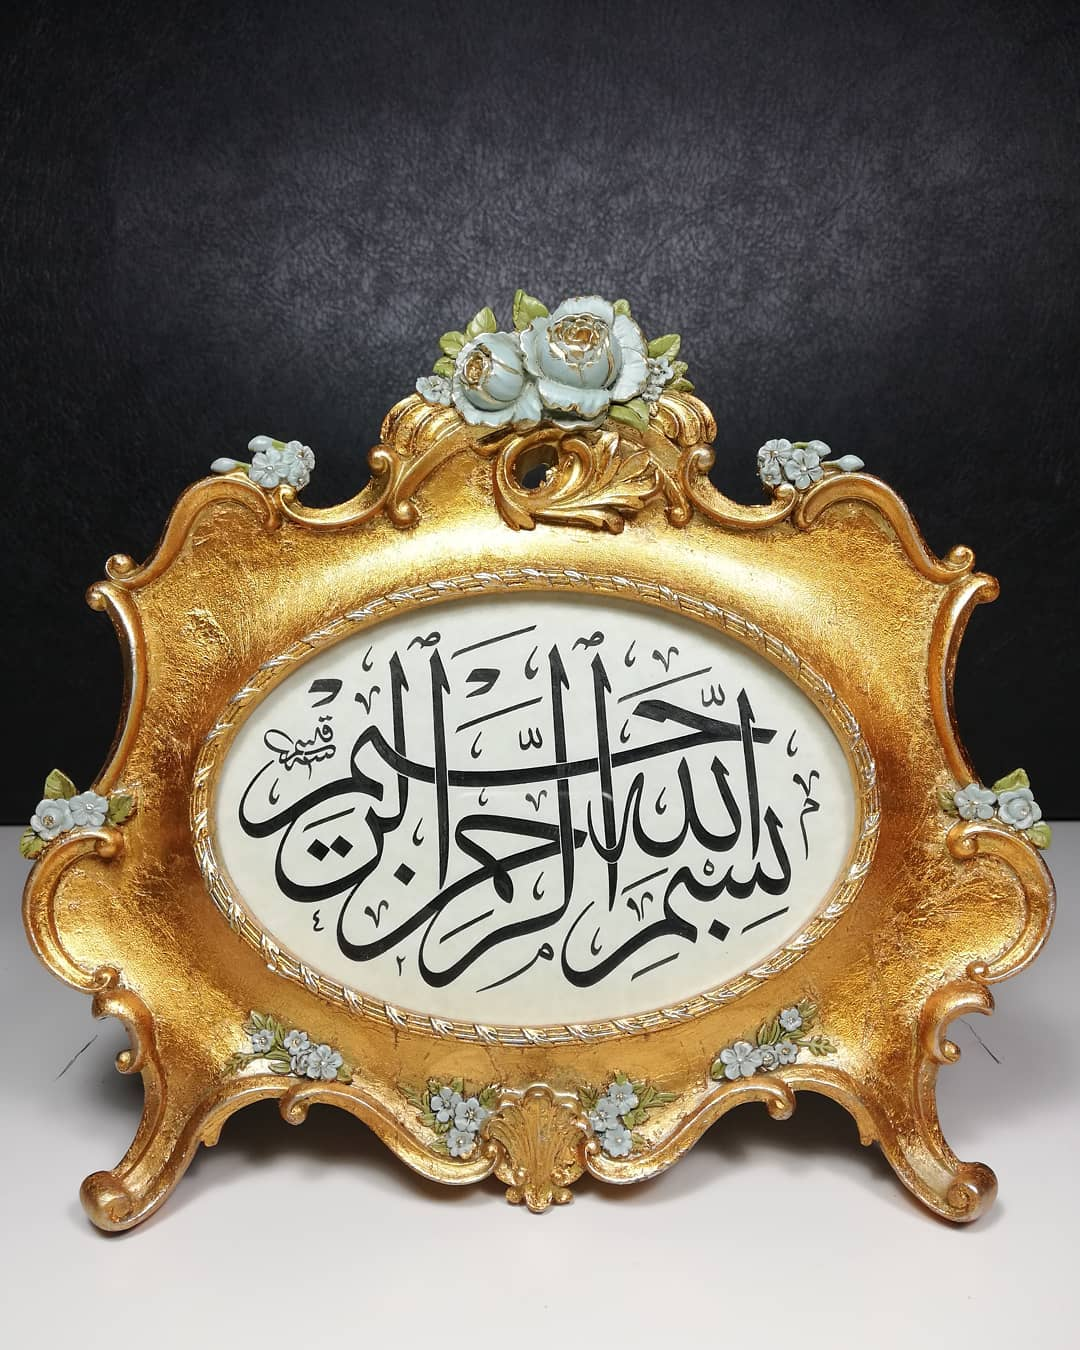 Hattat Kasım Kara قاسم قاره  Besmele-i Şerif…#besmele #hatsanatı #hattat #islamicart #kasımkara #sanat #tez… 216